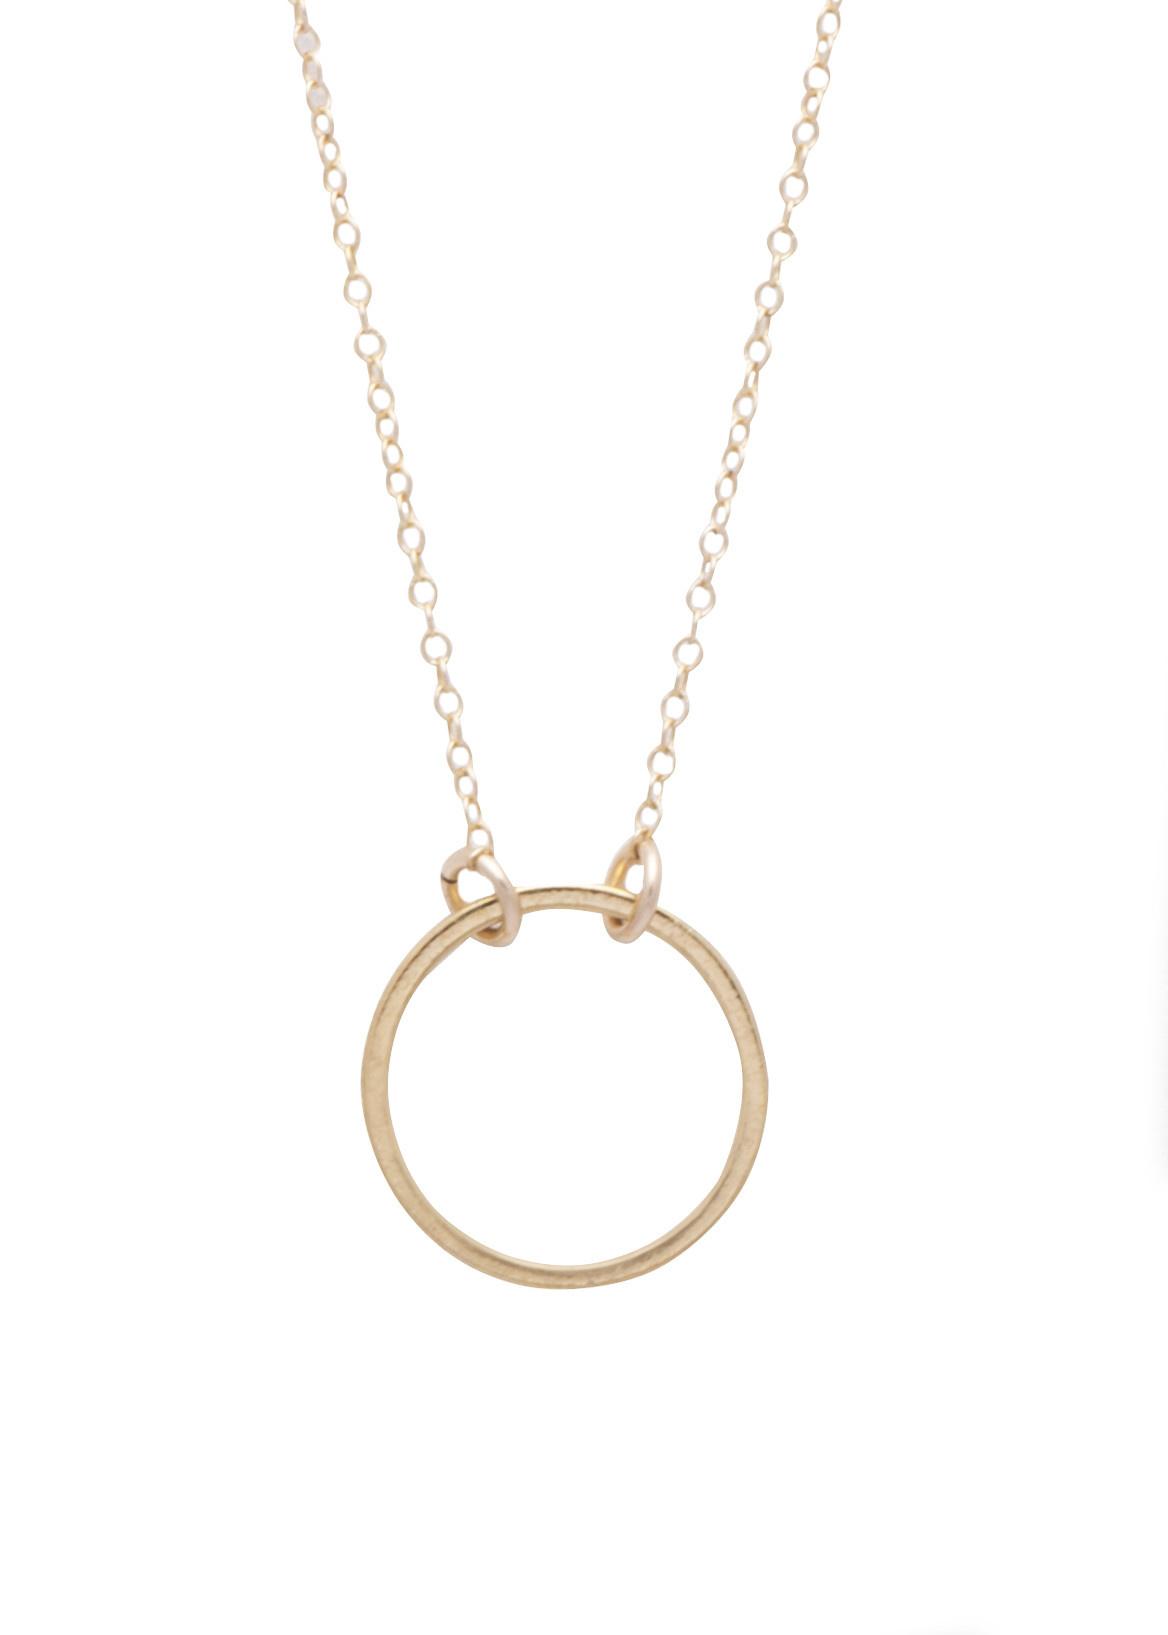 Sarah Mulder Jewelry Sarah Mulder Jewelry - Collier Sunday